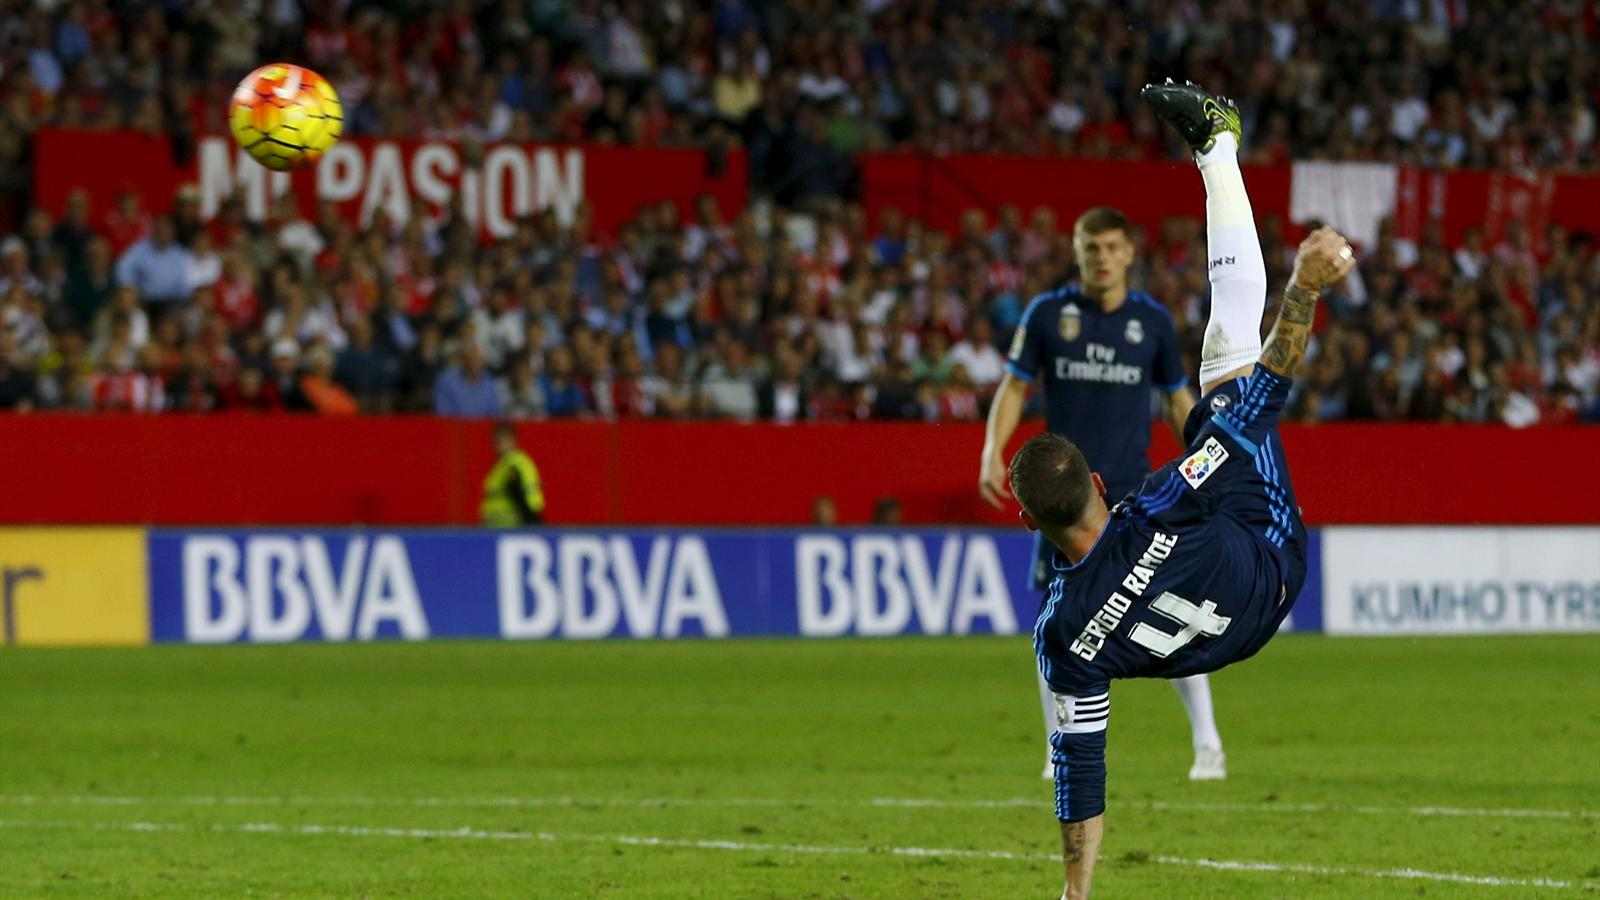 Real Madrid's Sergio Ramos kicks the ball to score against Sevilla